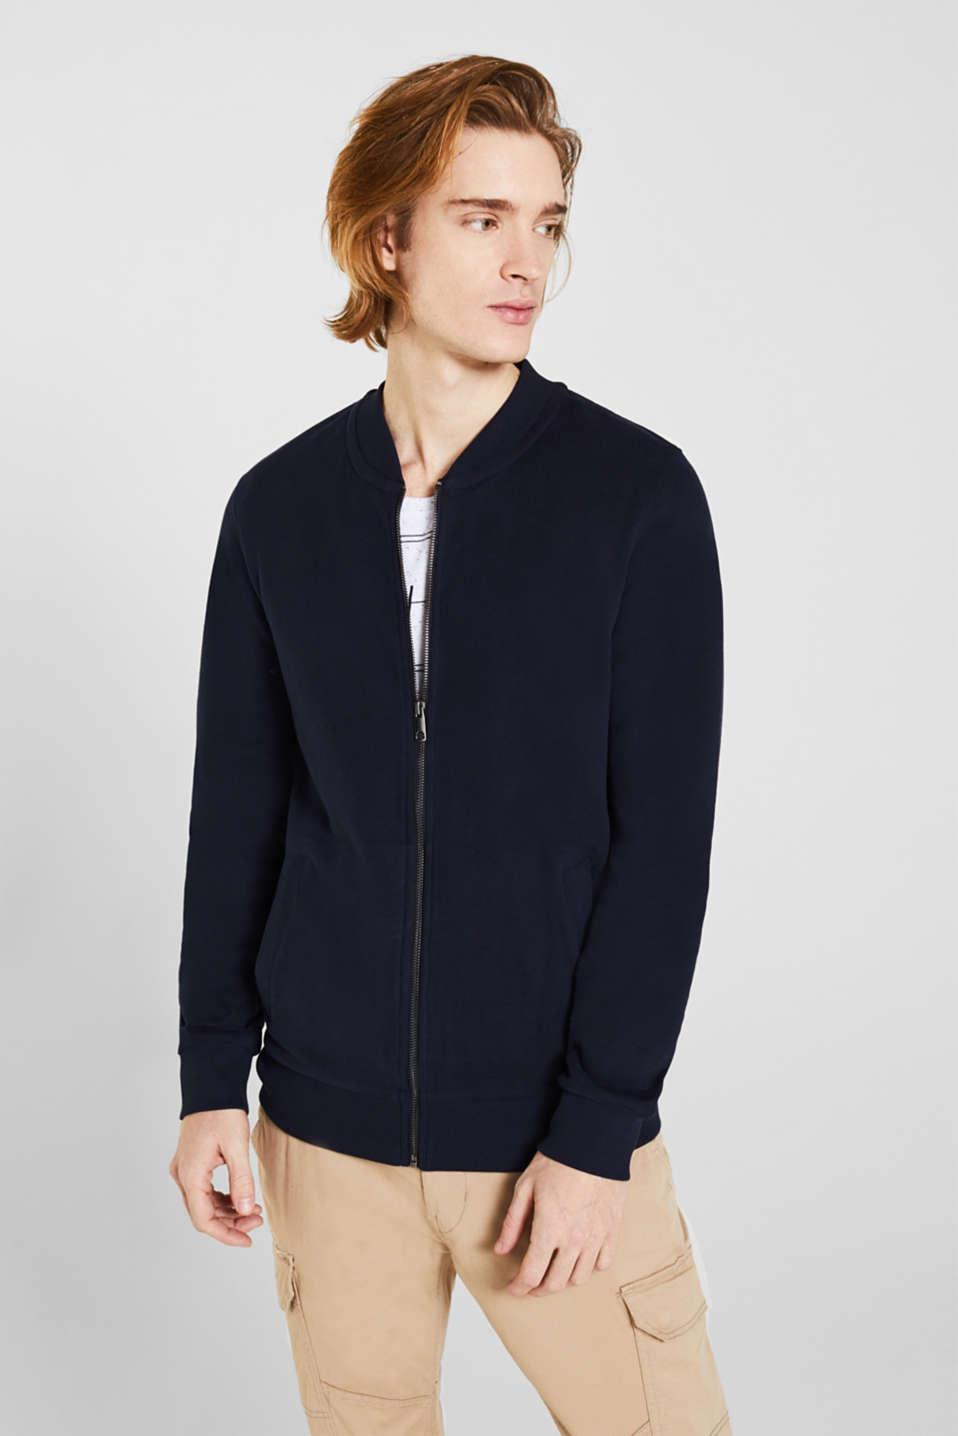 Bomber-style sweatshirt jacket, 100% cotton, NAVY, detail image number 0